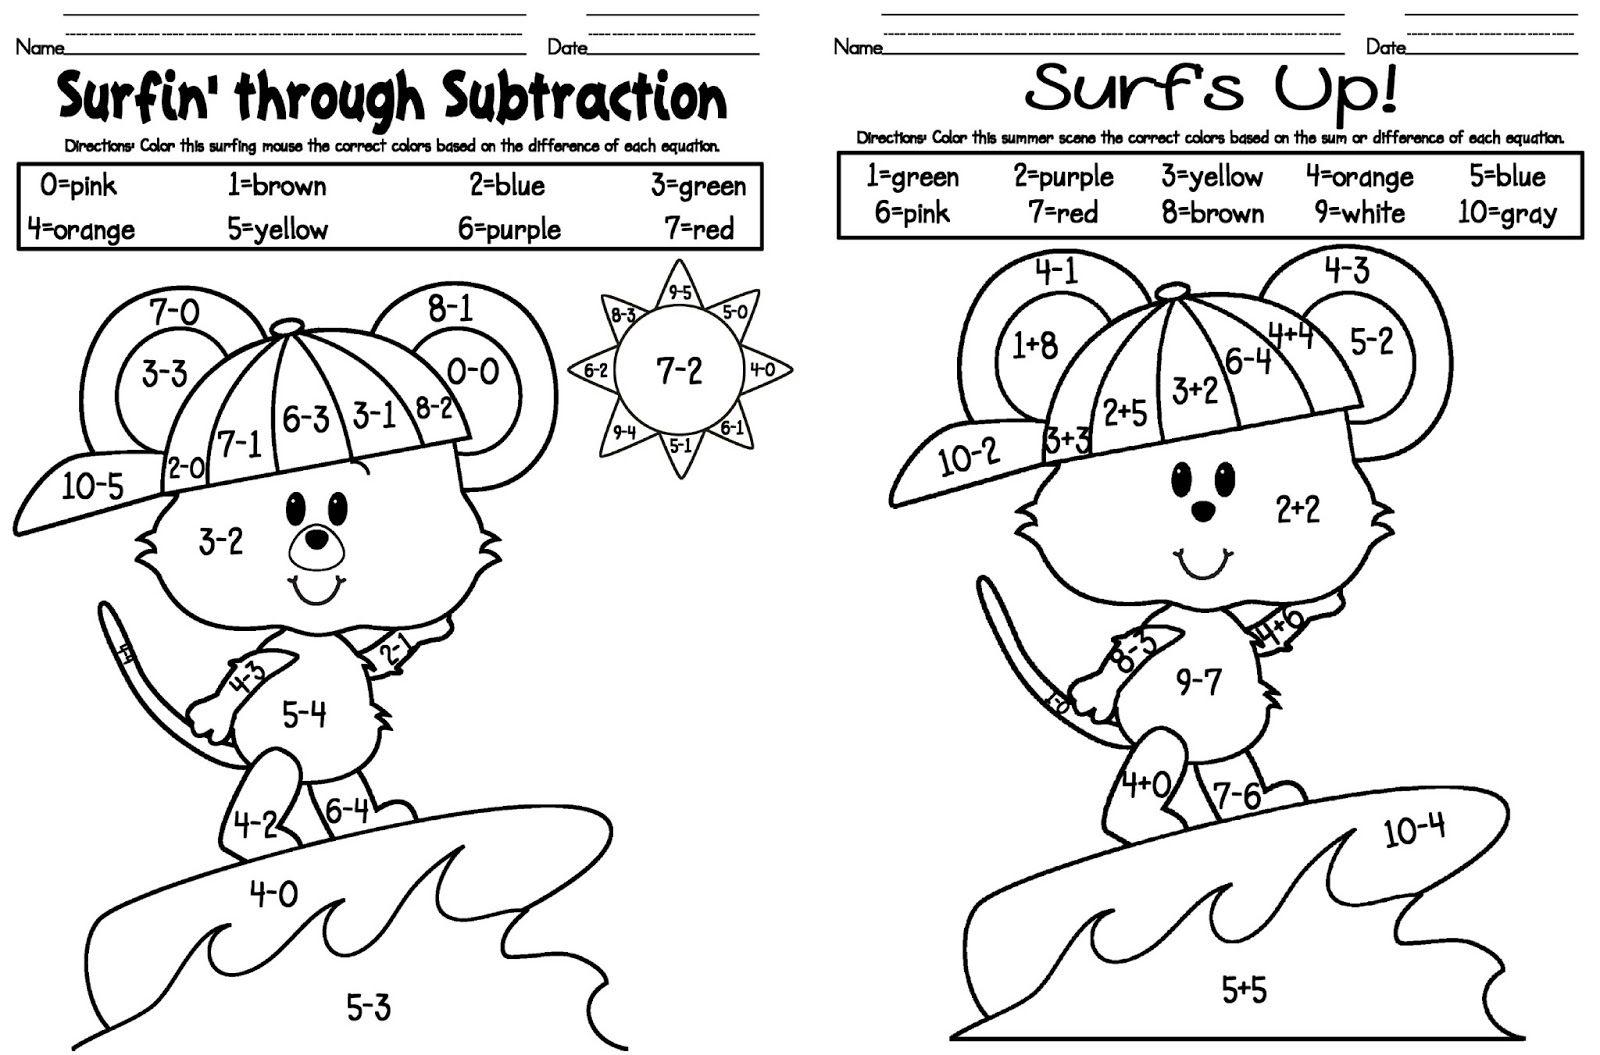 addition and subtraction coloring sheets kinder june pinterest surfers coloring sheets. Black Bedroom Furniture Sets. Home Design Ideas